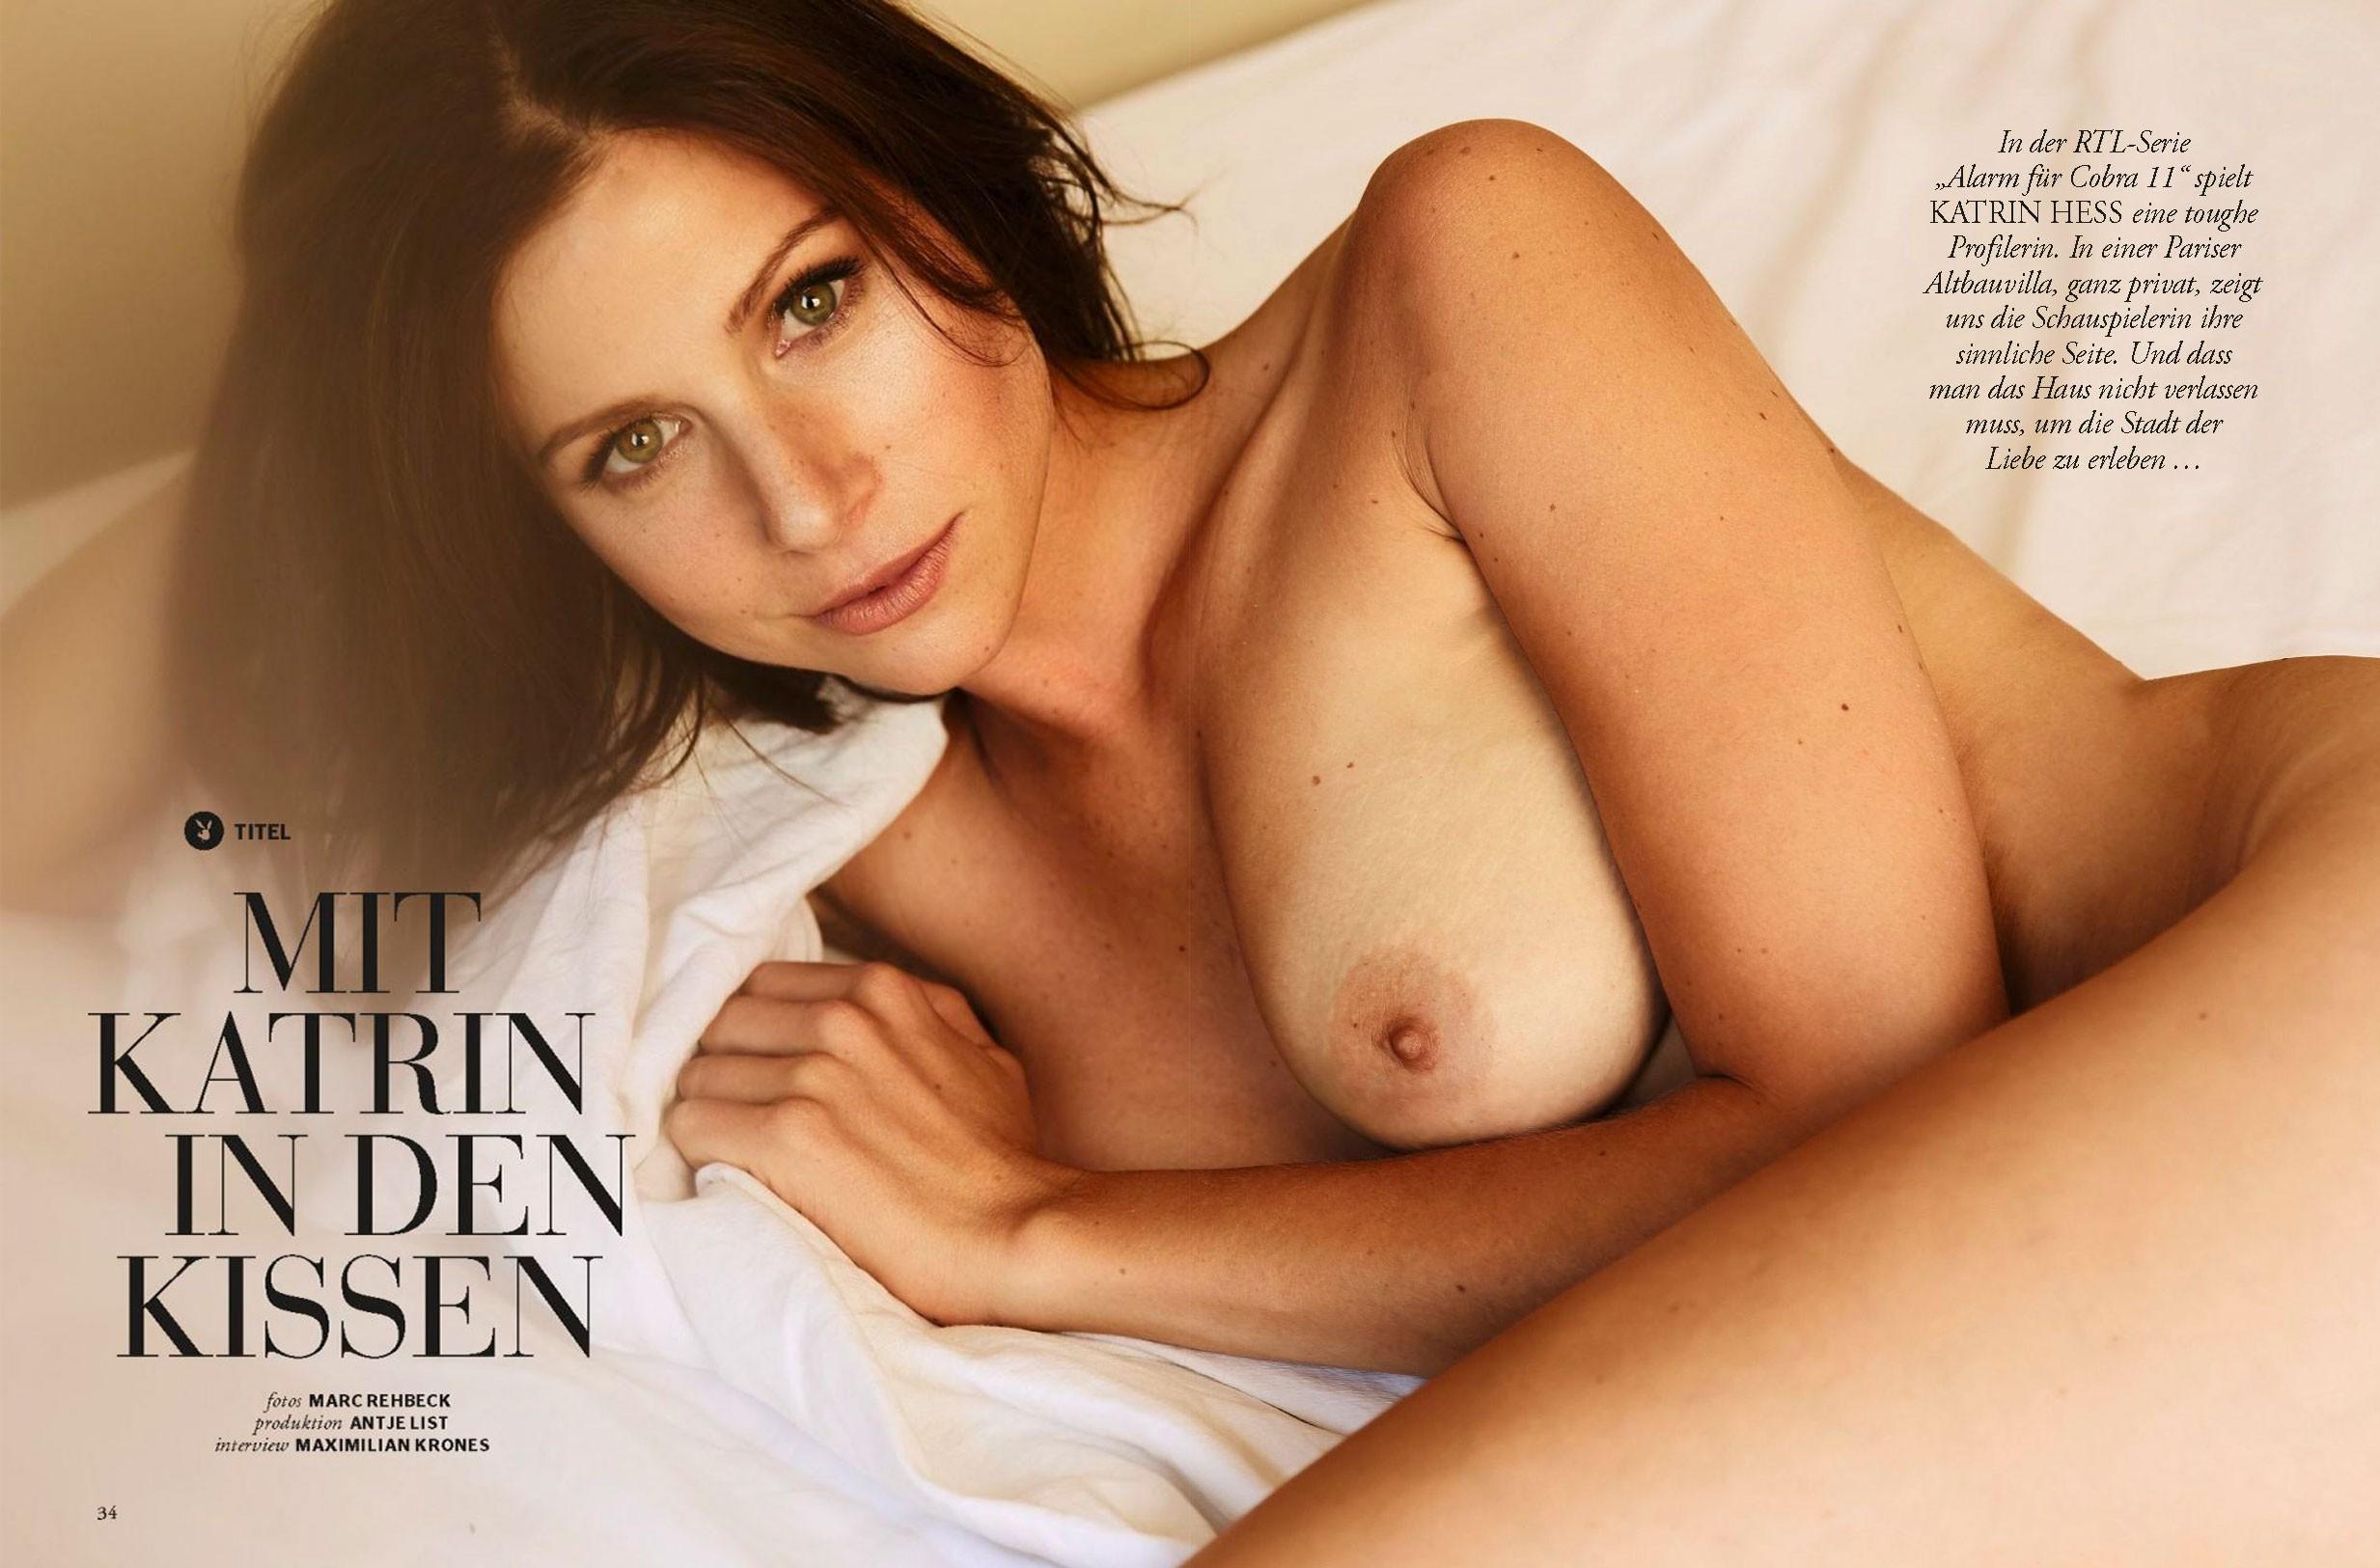 Katrin hess topless - 2019 year